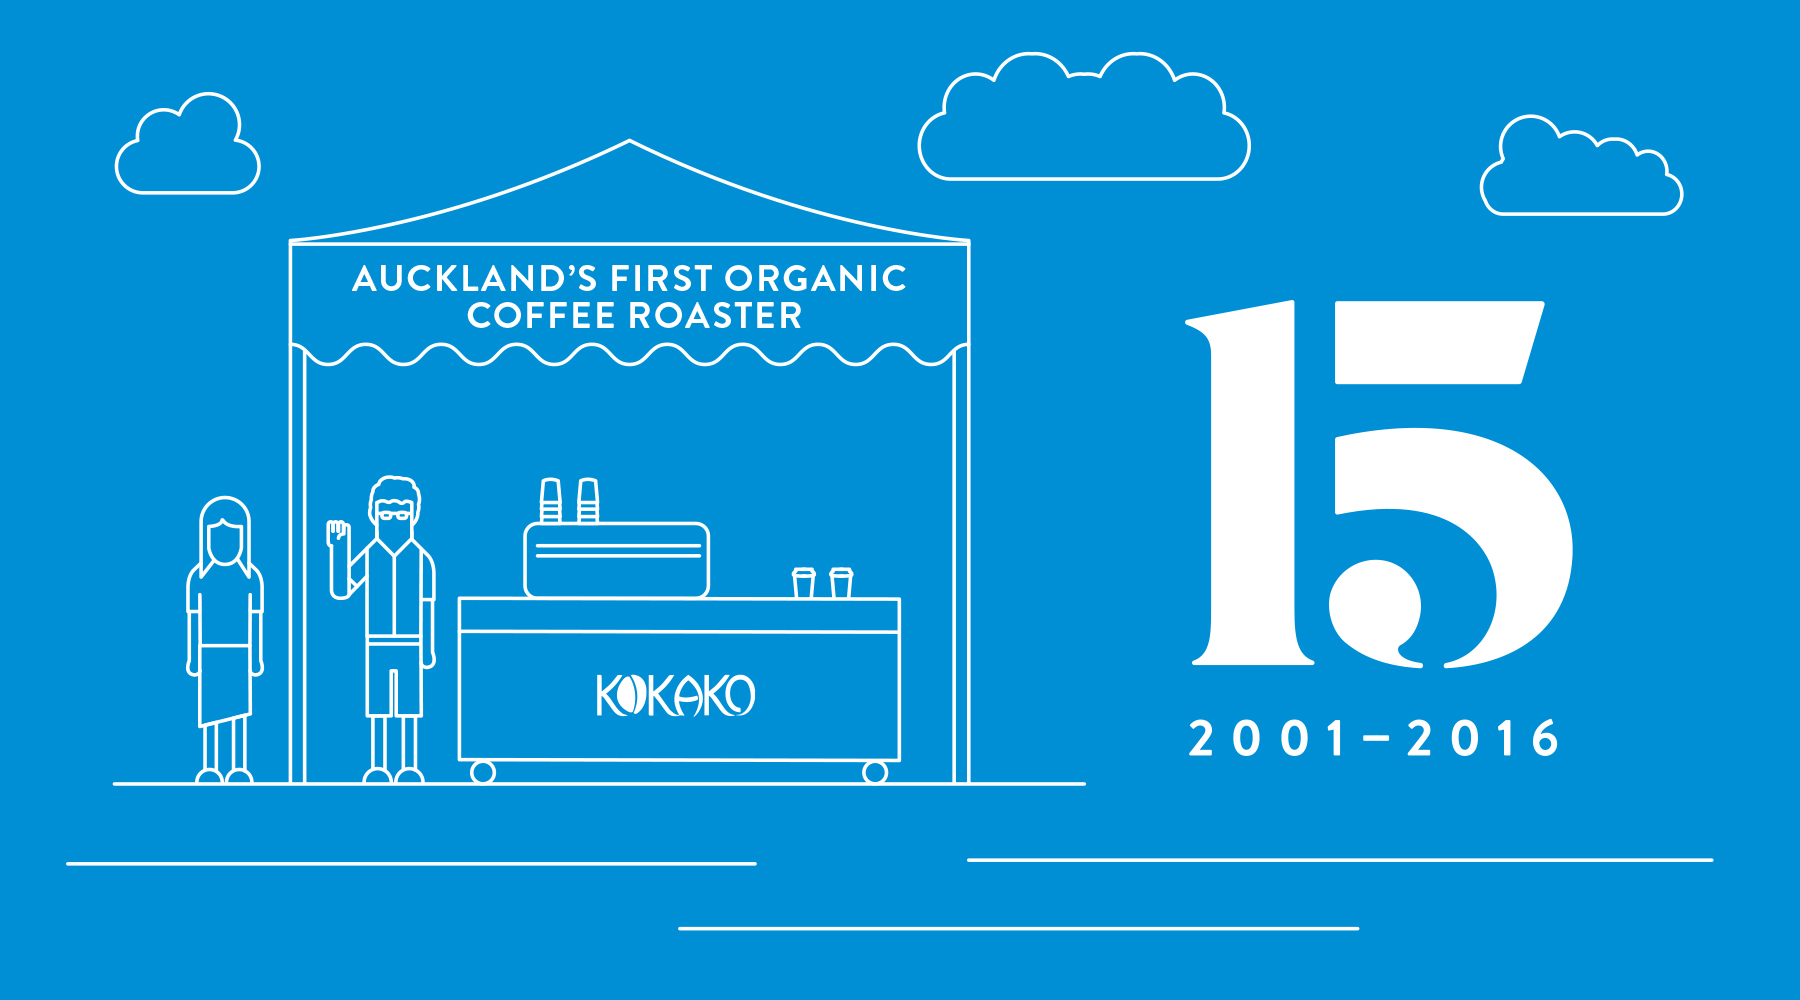 For more info on Kokako Coffee click on the image above.